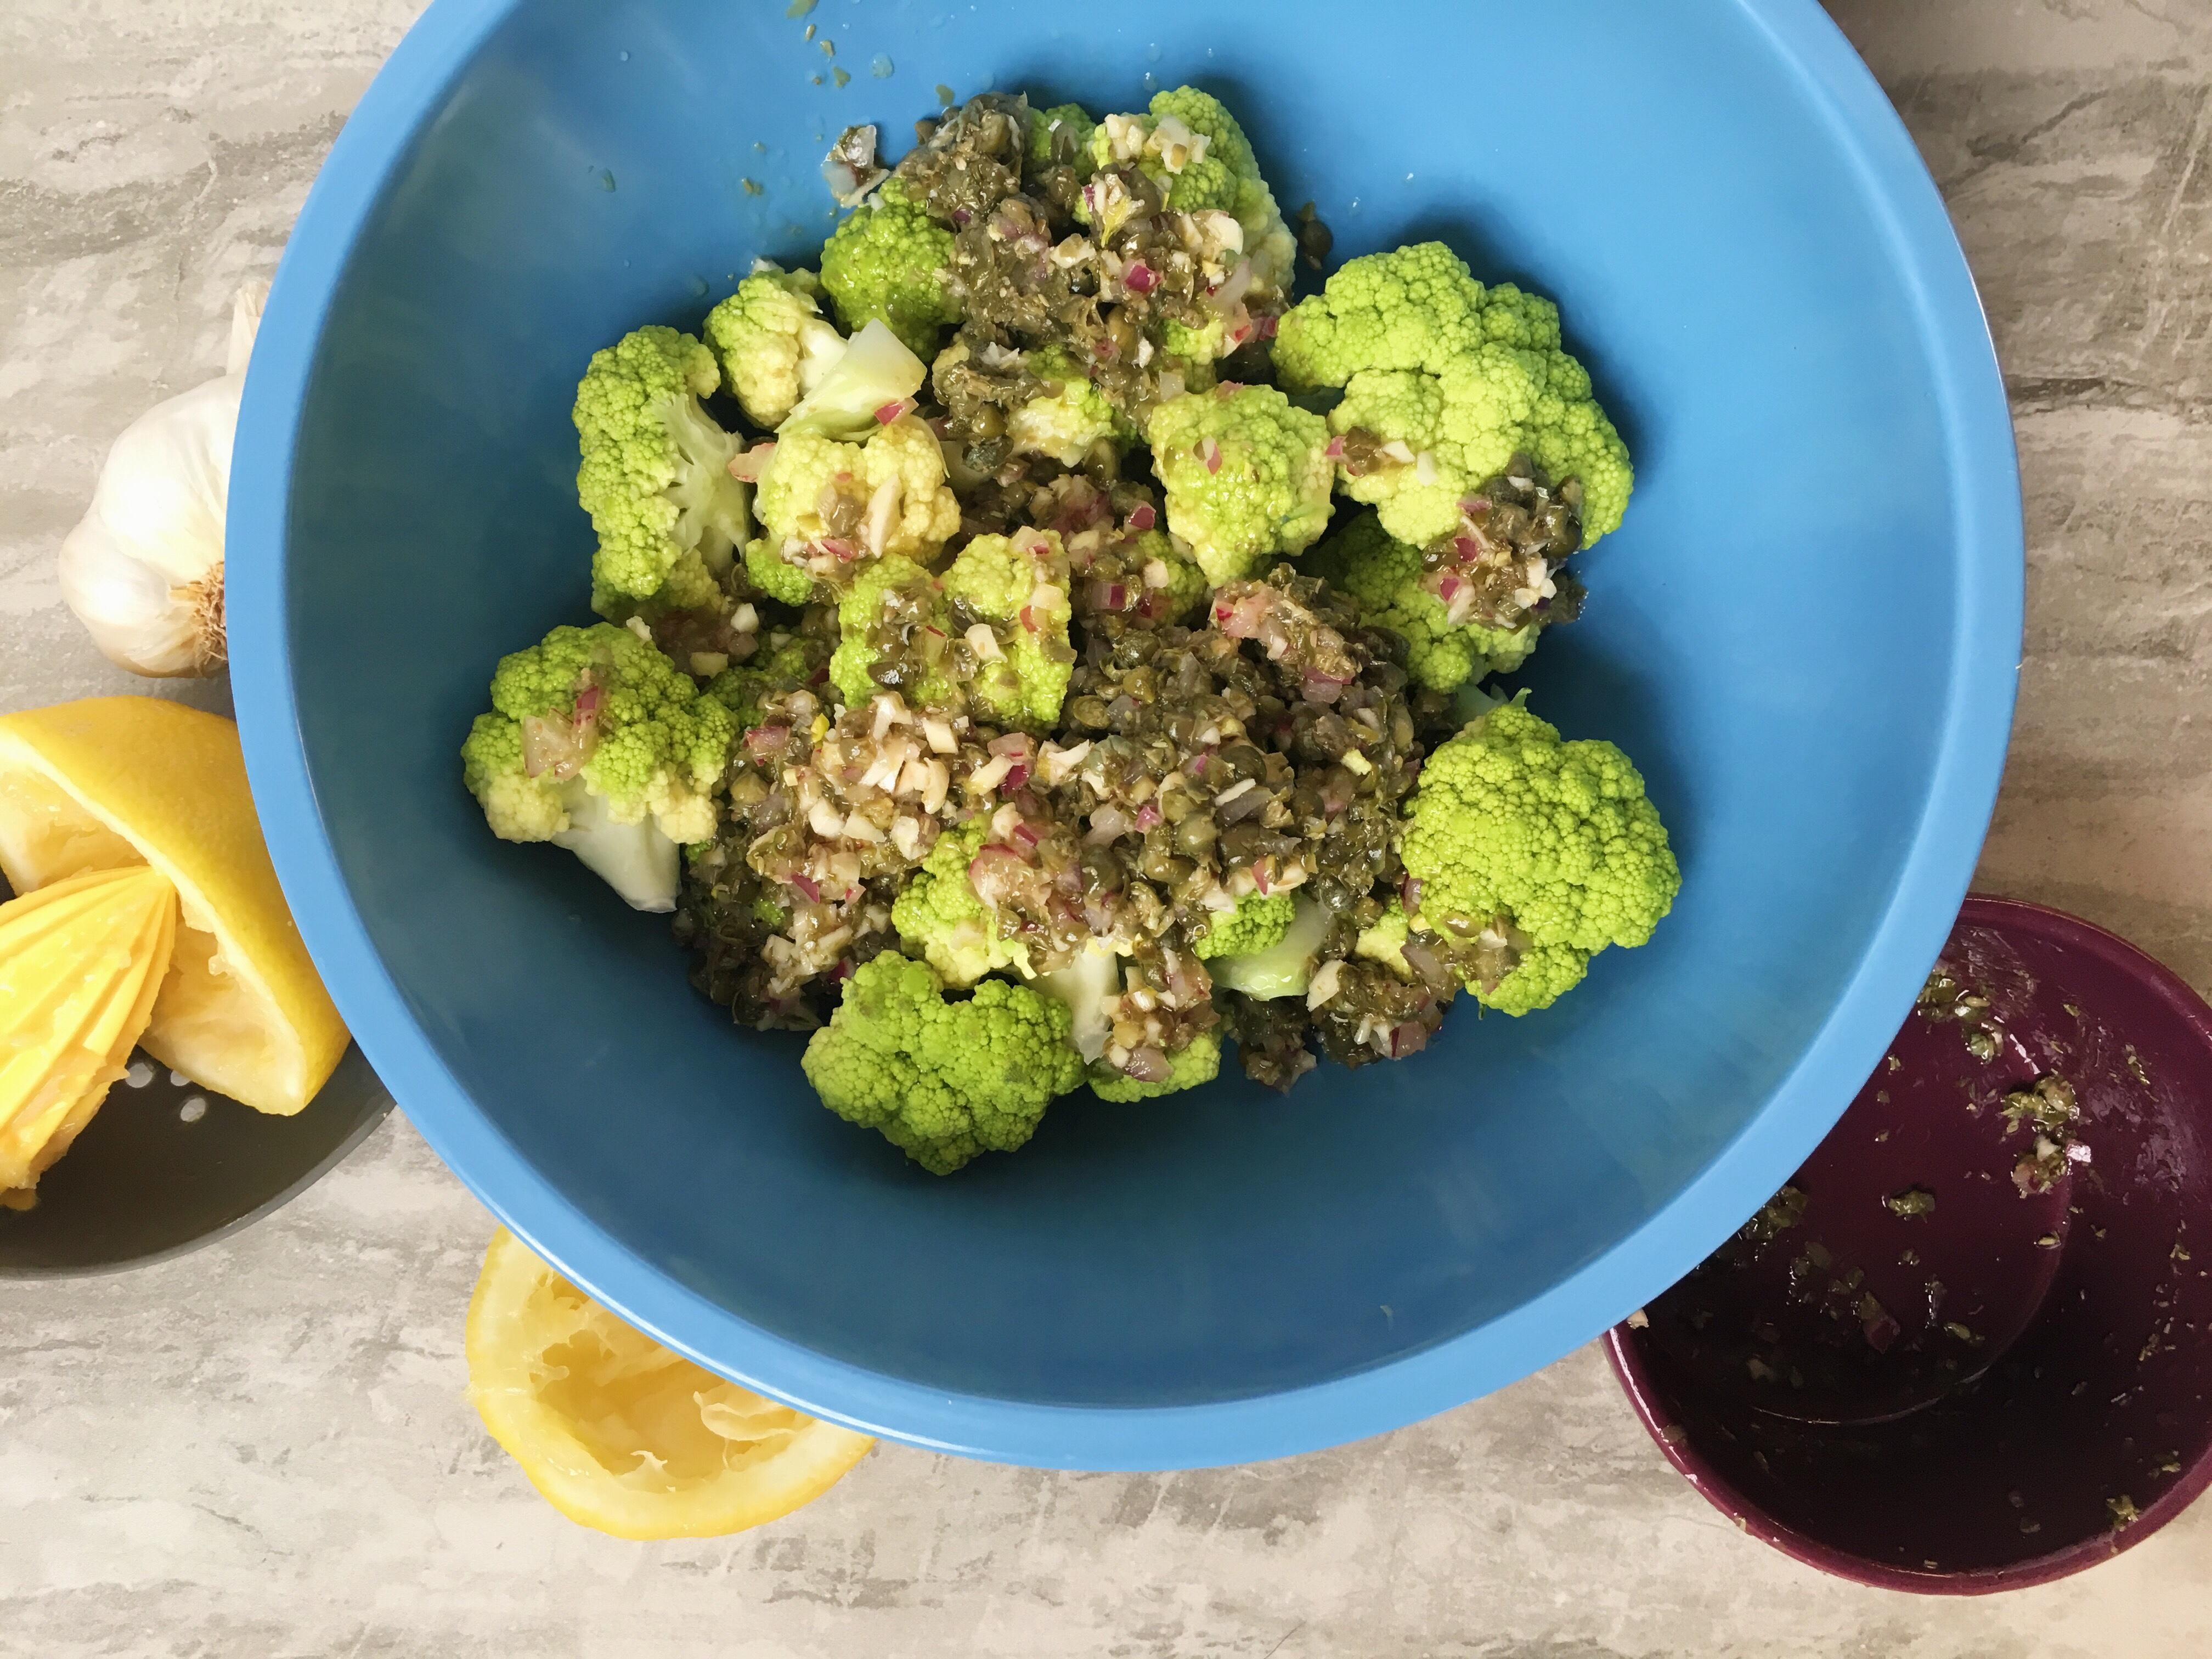 Green cauliflower marinating in sauce